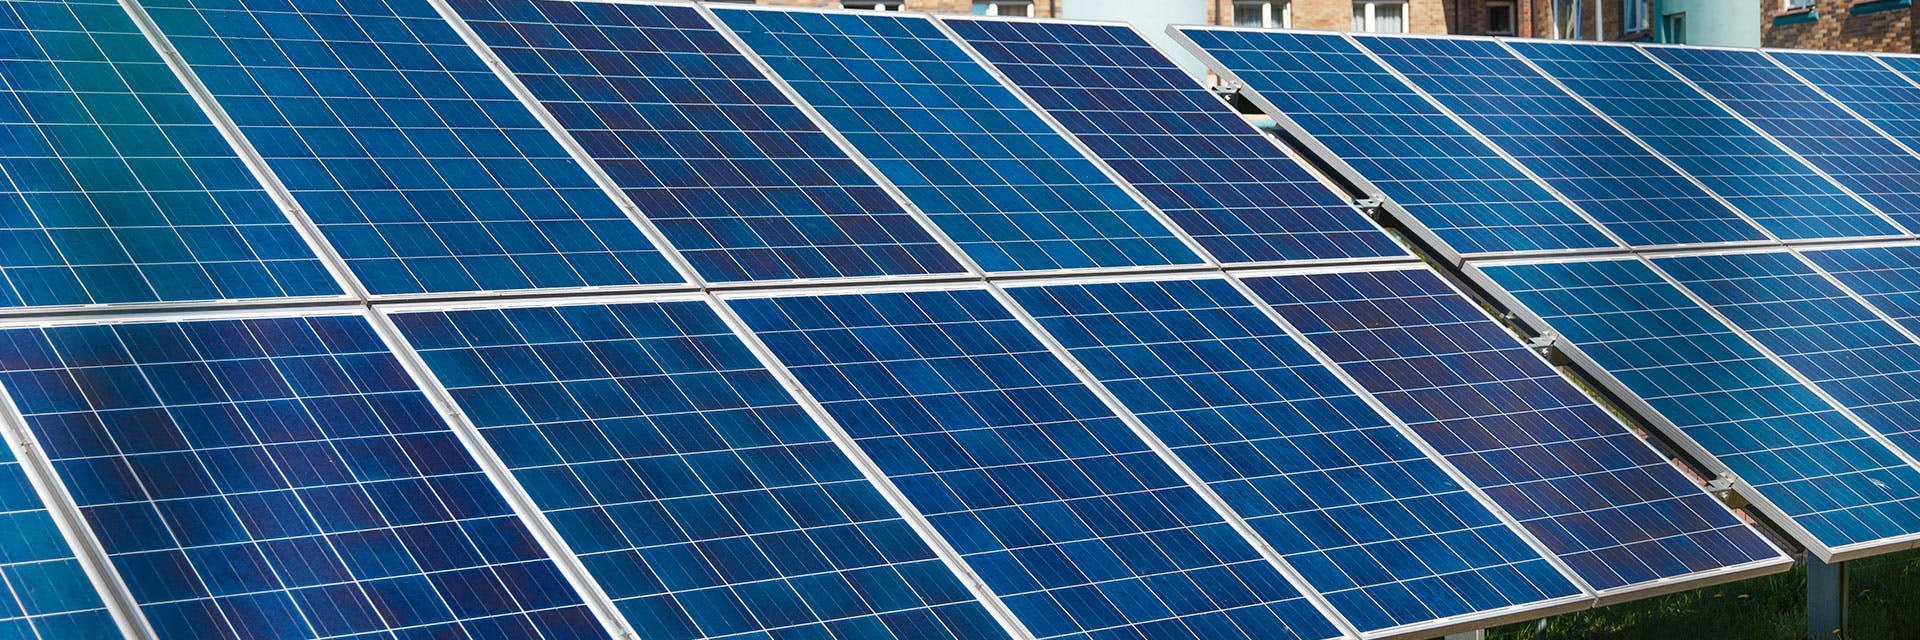 16x10-enery-solar.jpg